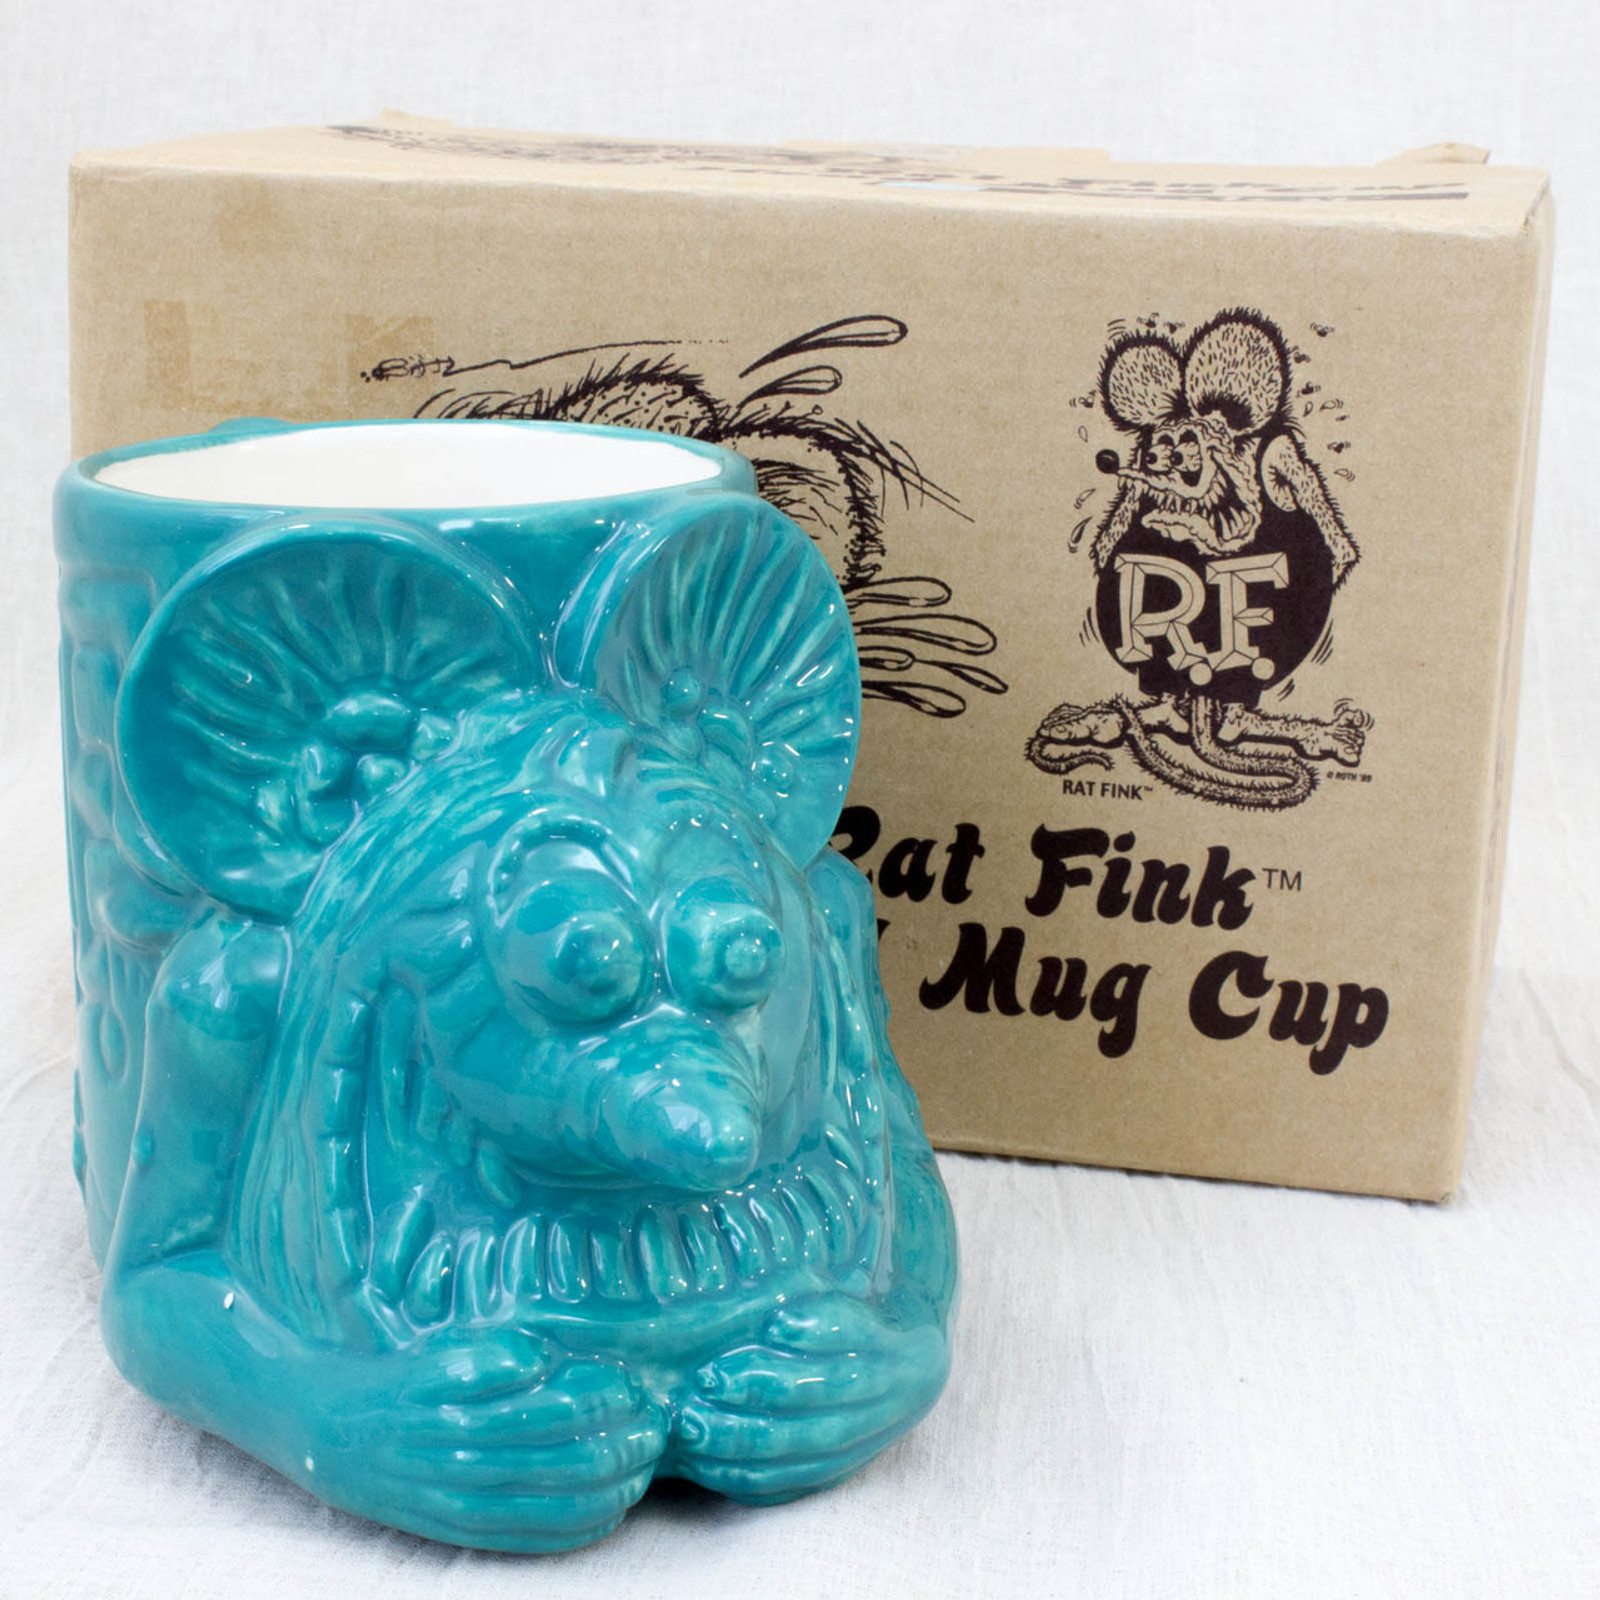 RAT FINK Head Mug Cup Green ver. Moon of Japan Inc. 2008 Big Daddy JAPAN